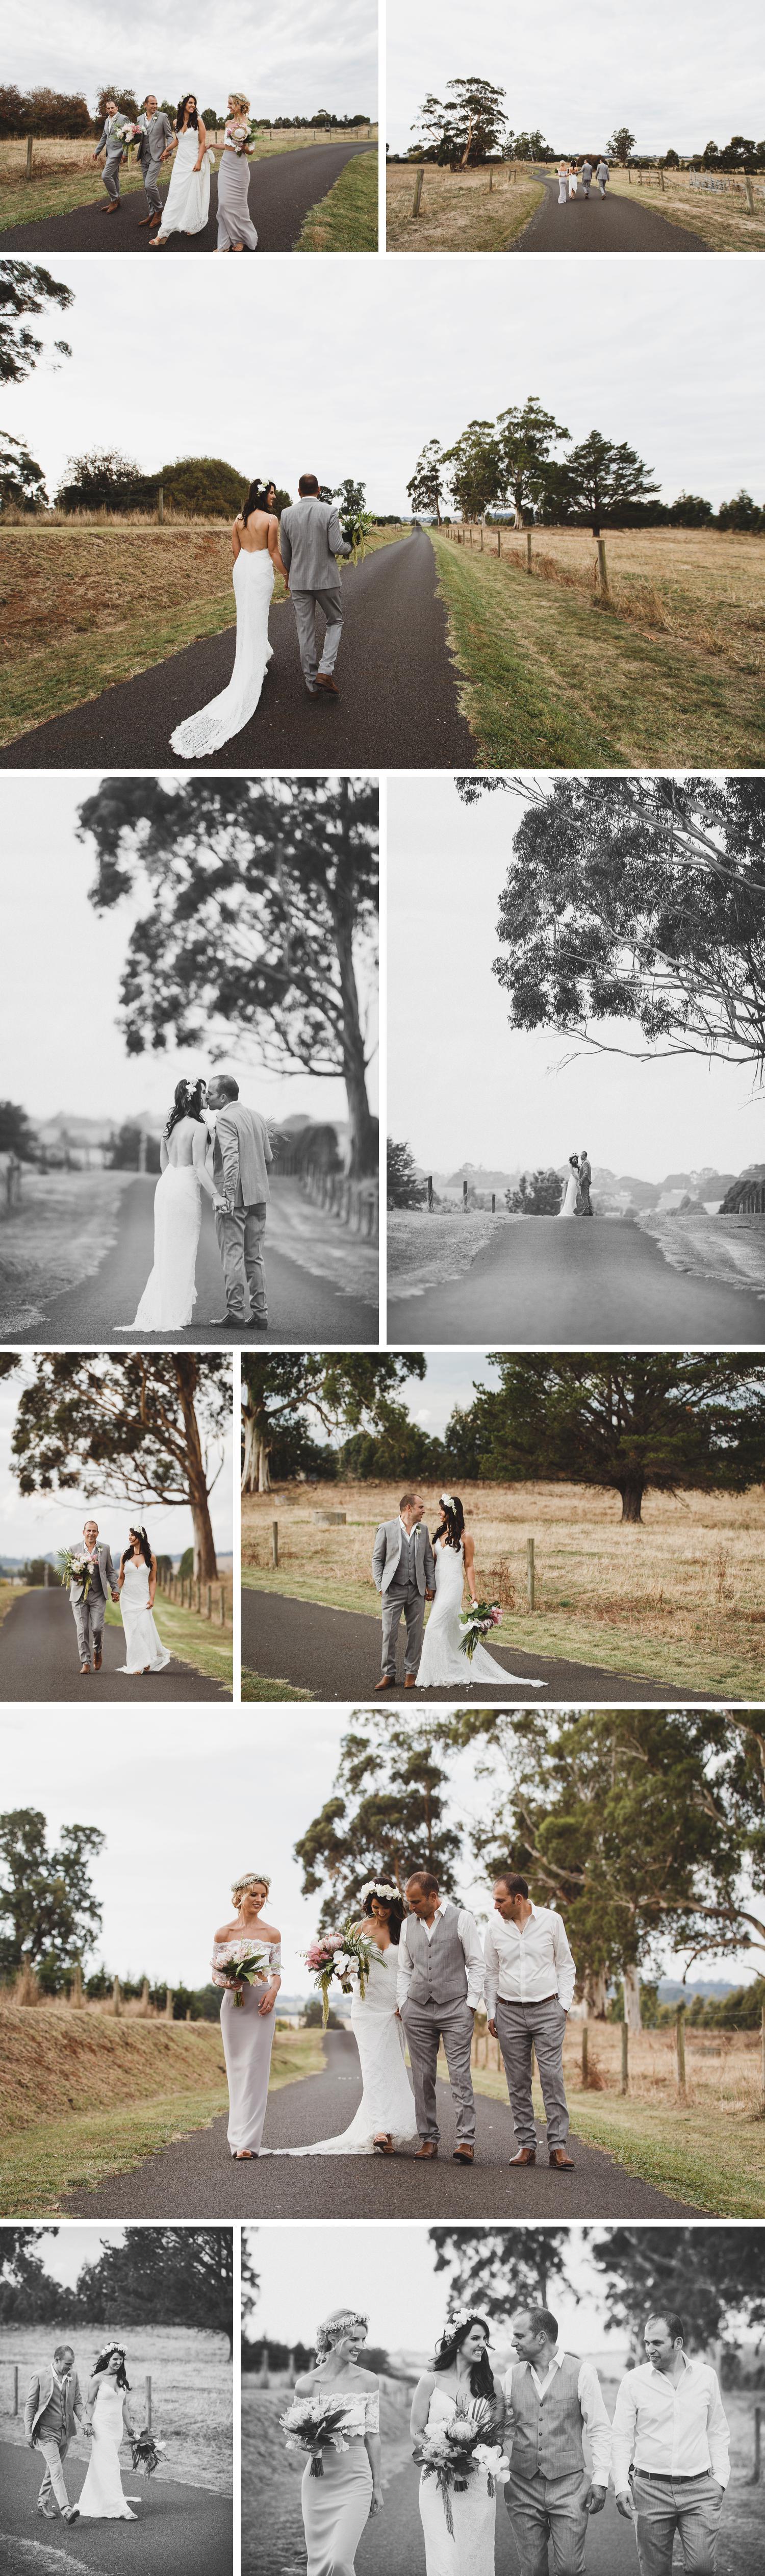 Tropical Boho Wedding, Rural Wedding on Family Property, Bride and Groom Holding Hands Wedding Photo by Danae Studios